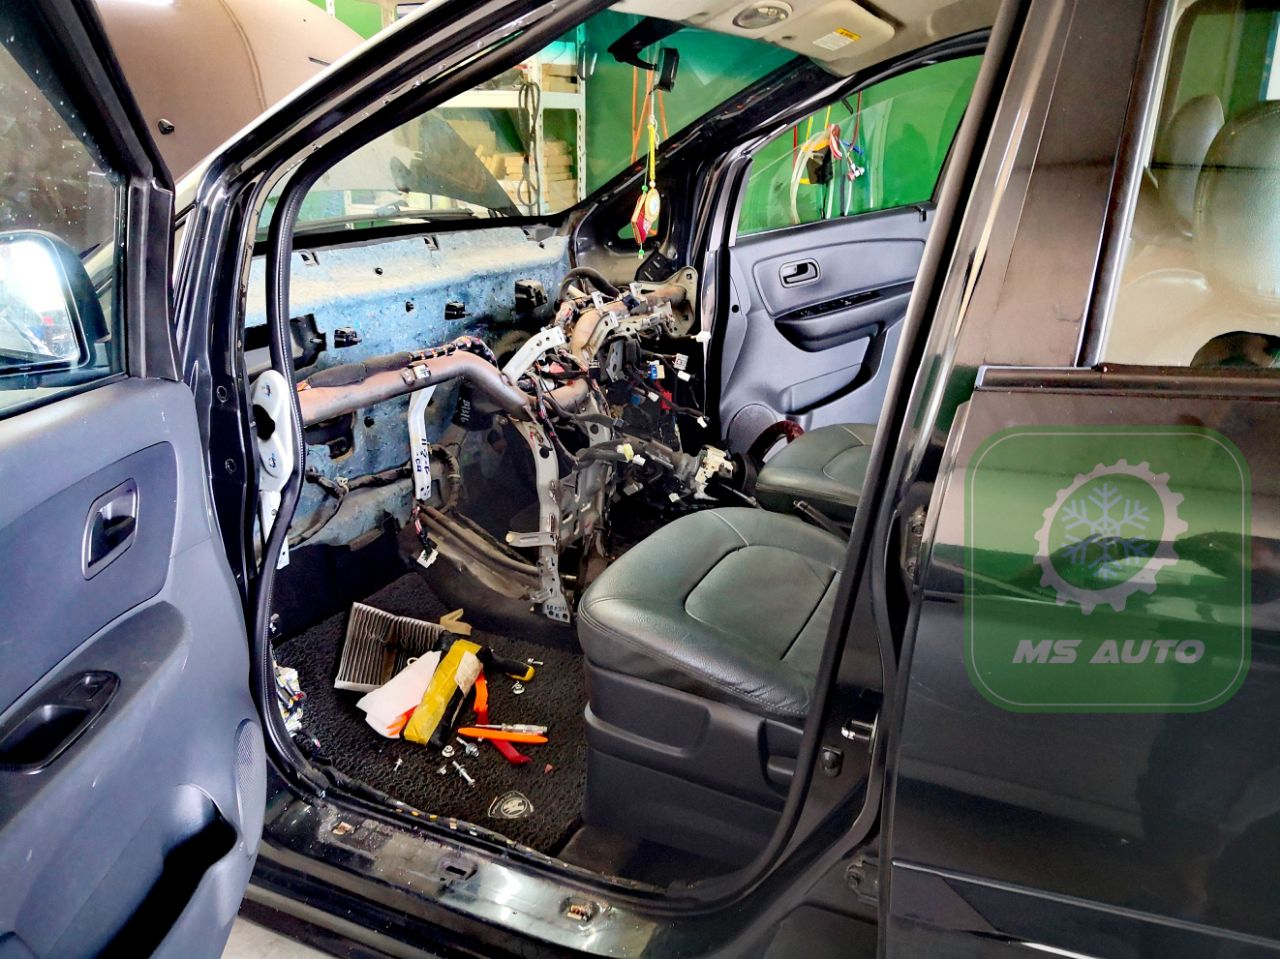 Masalah Aircond Kereta Proton Exora Ms Auto Aircond Servis